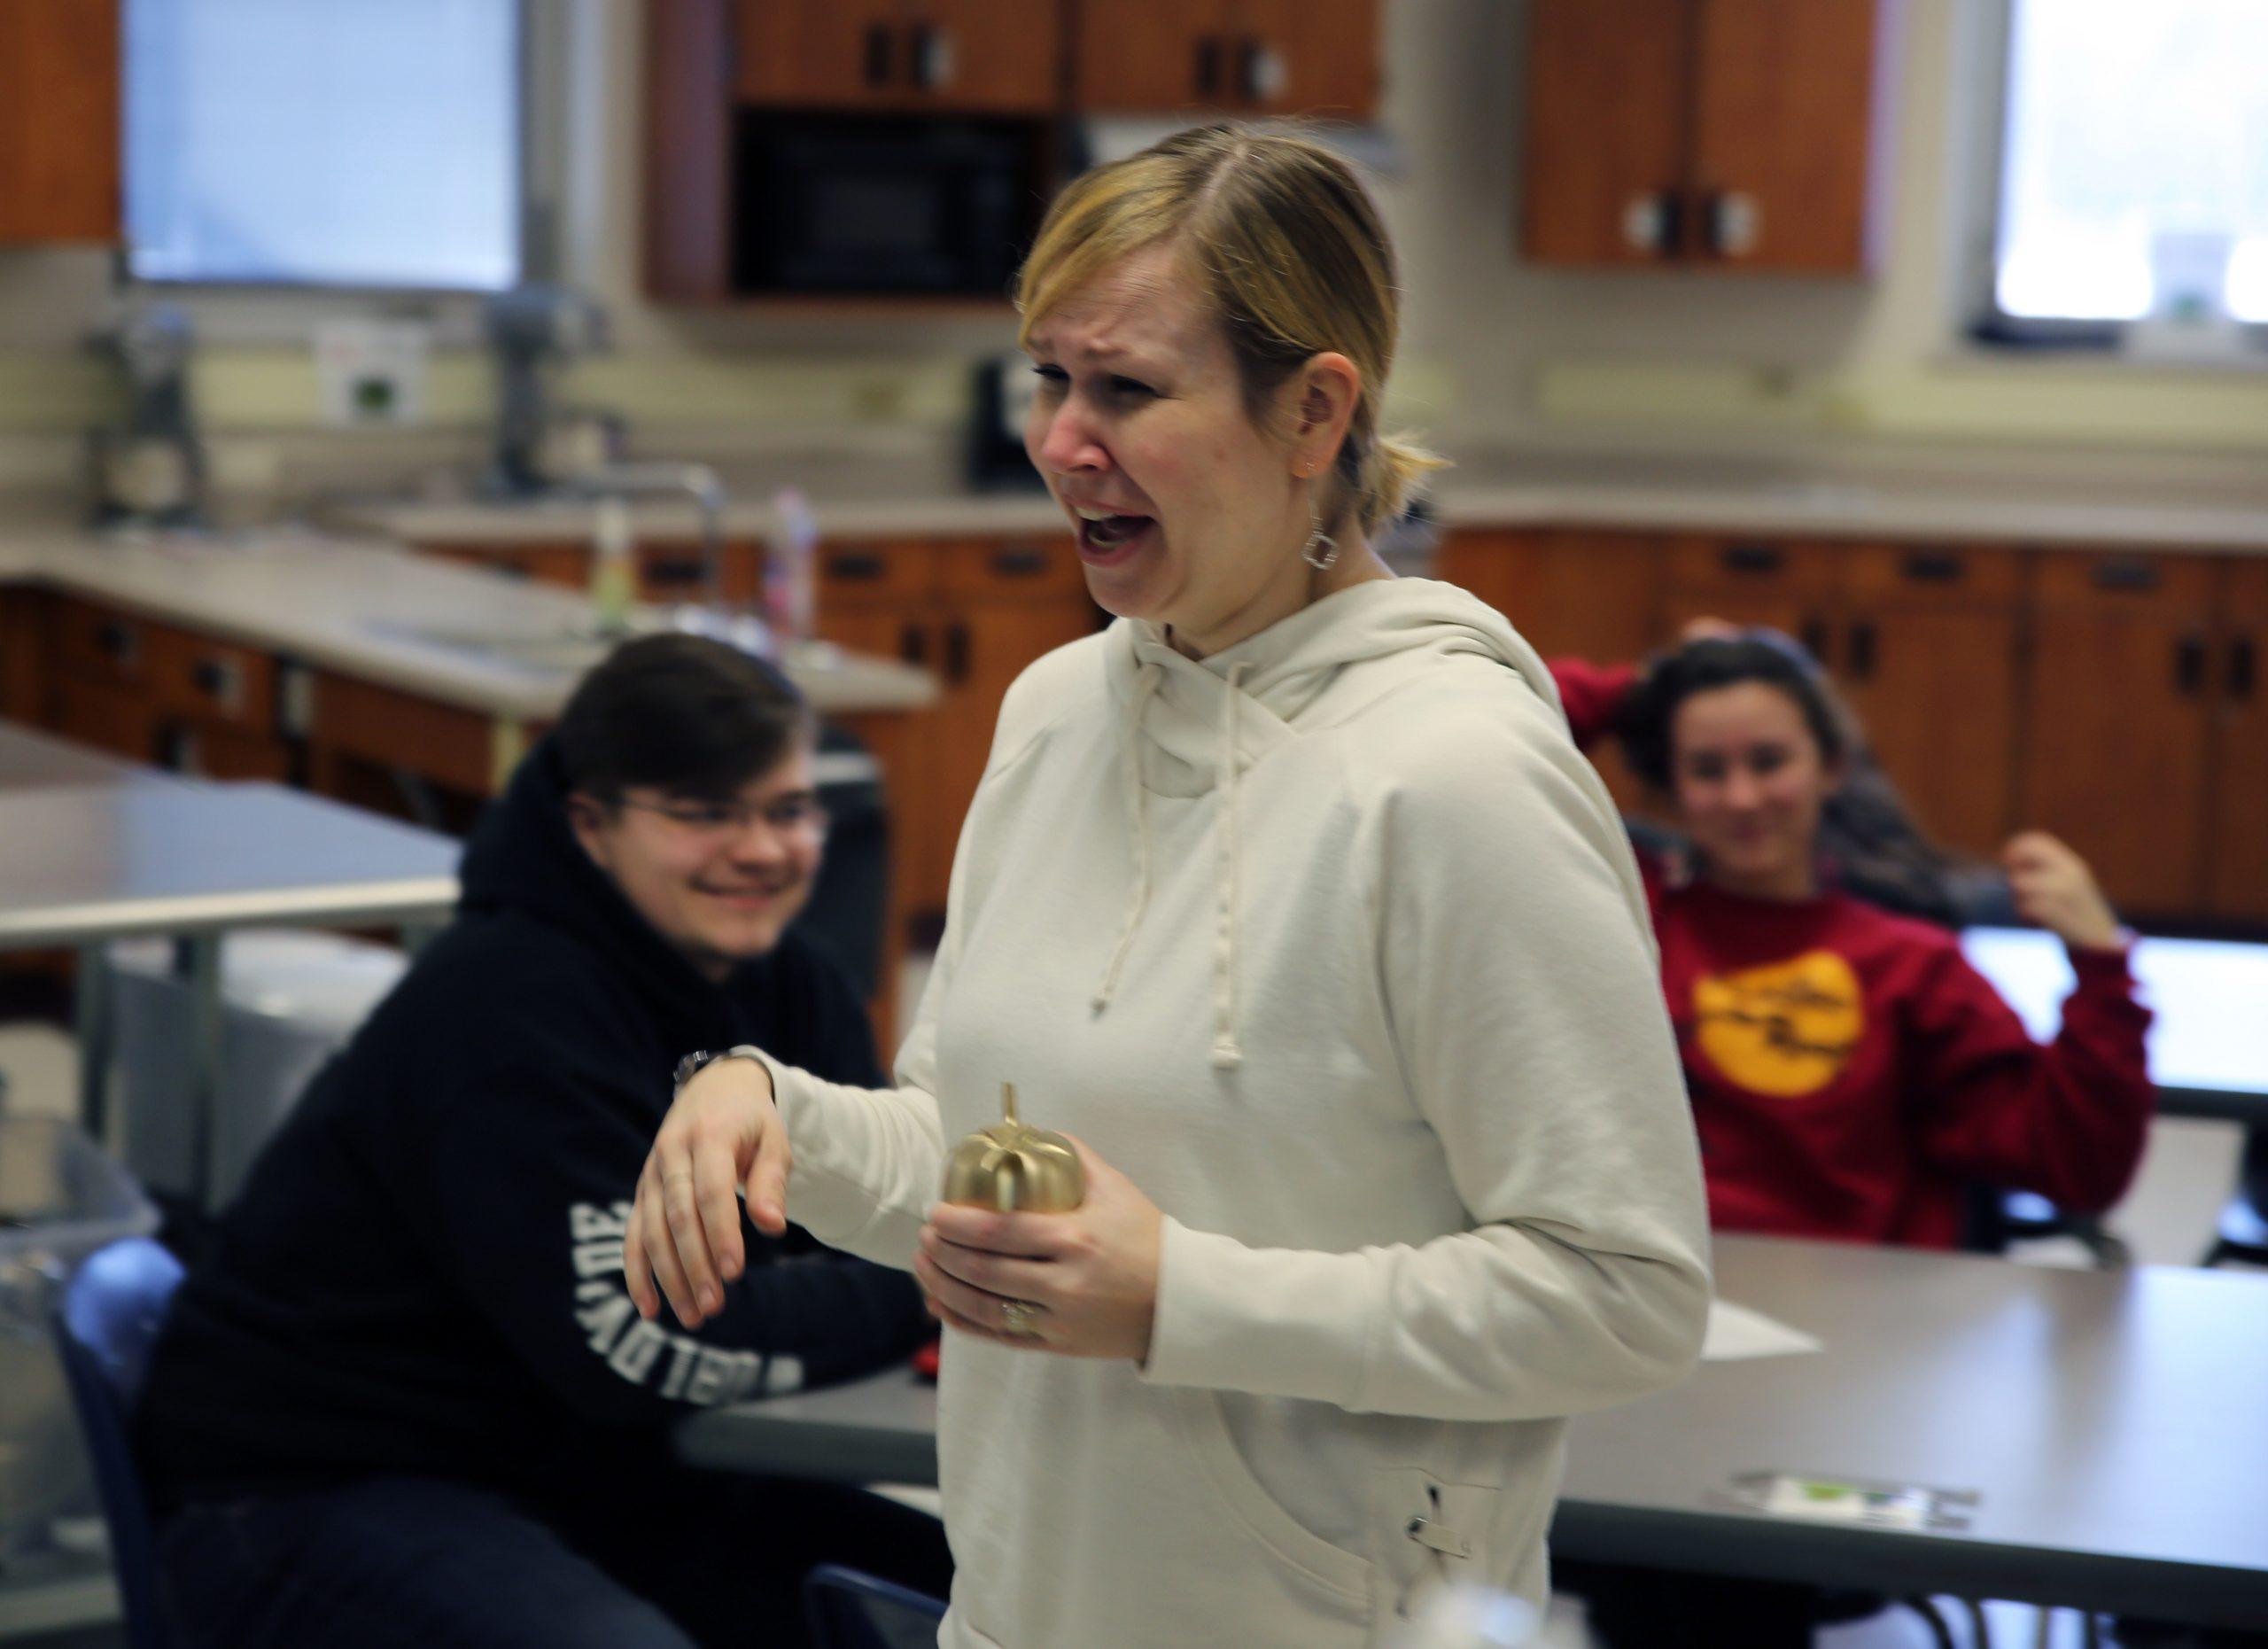 Pulaski teacher learns of award during class